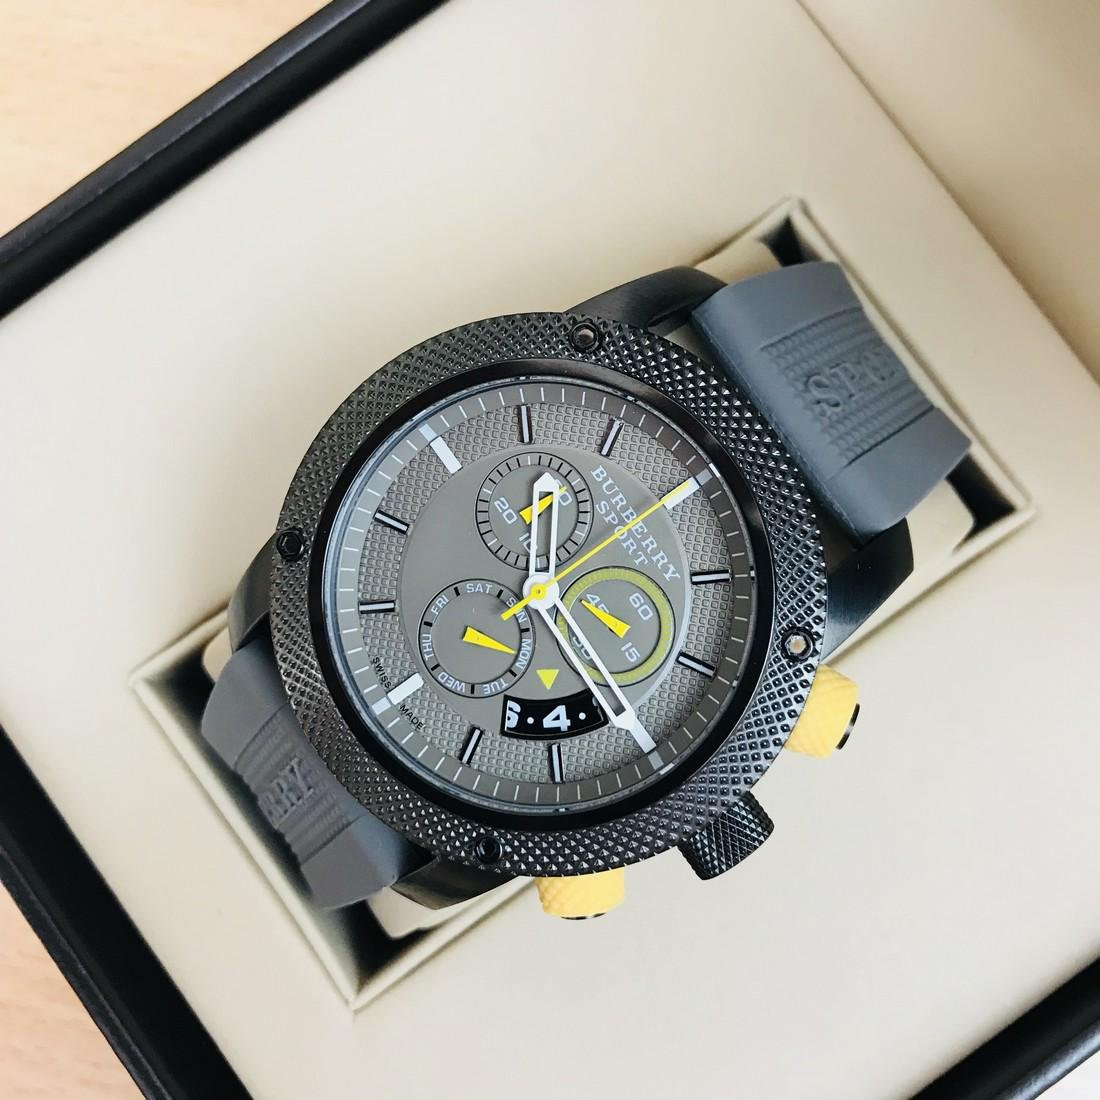 Burberry Endurance Swiss Made Men's Chronograph Watch - 3